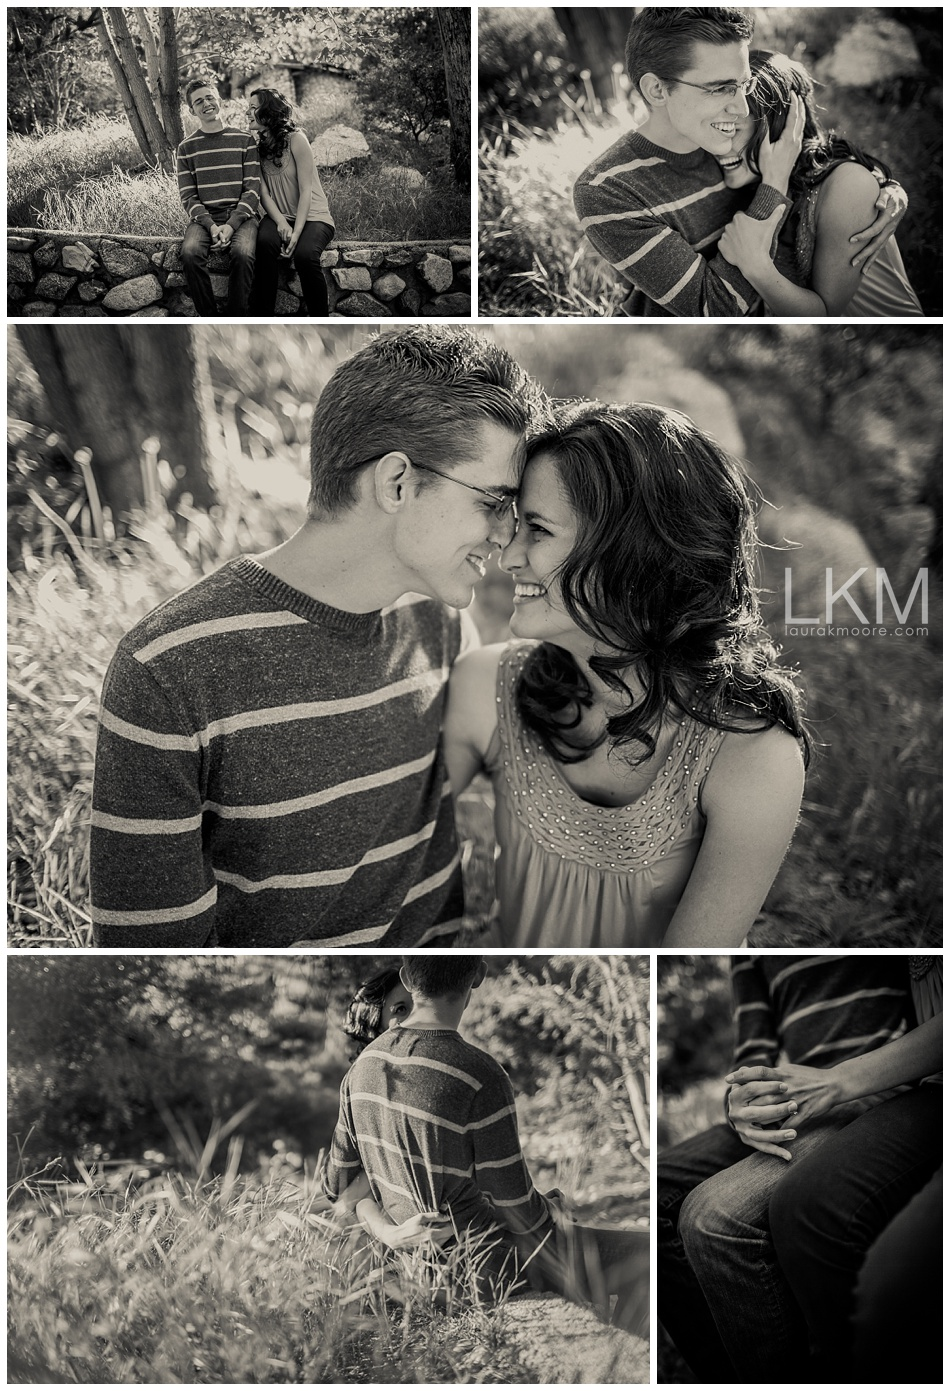 Nathan-Emily-Mt-Baldy-Engagement-Session-Los-Angeles-Wedding-Photographer_0001.jpg